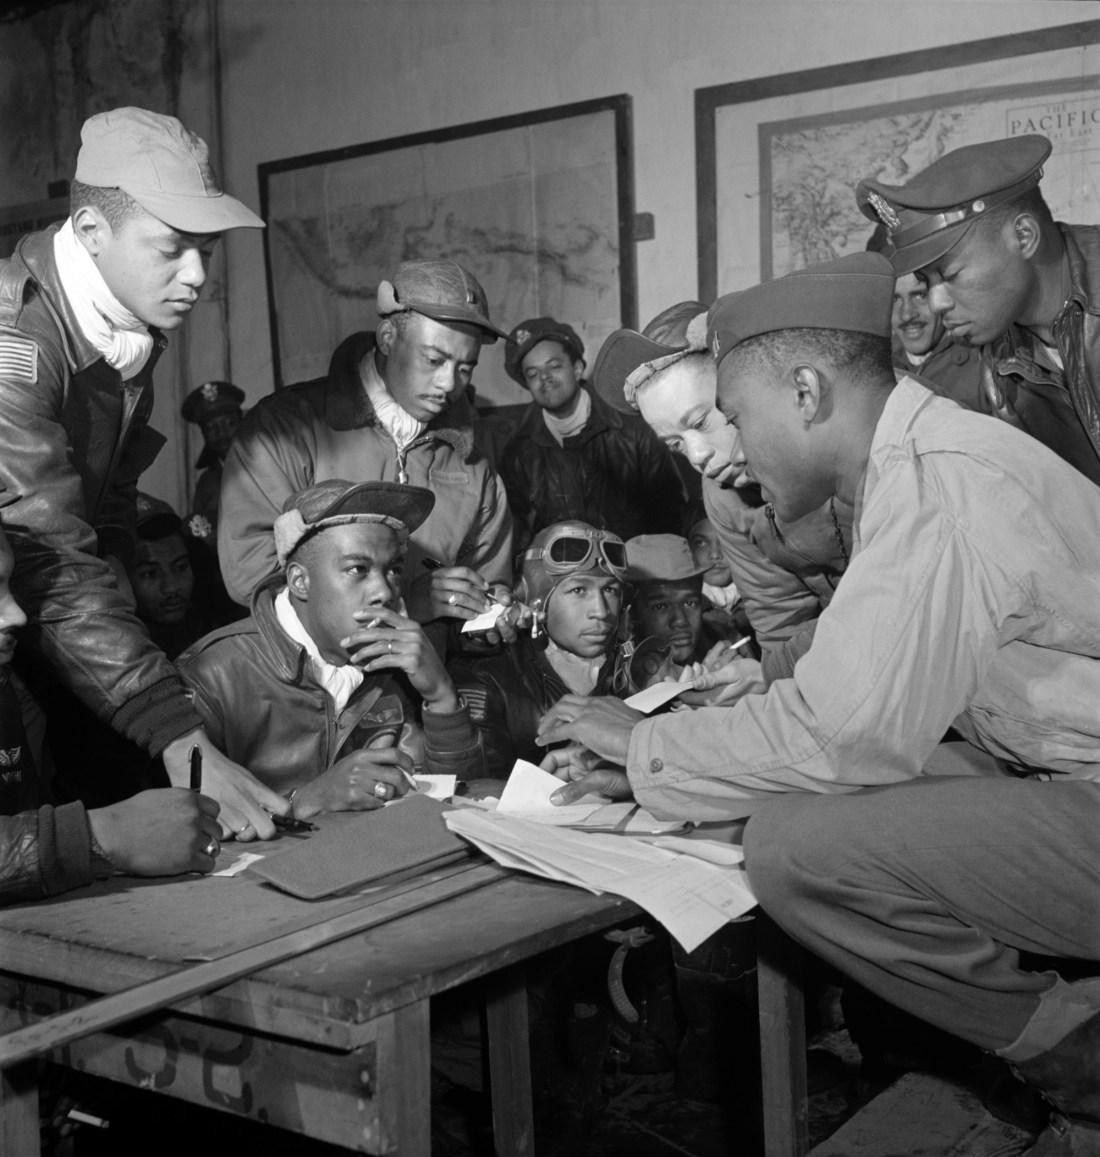 African American History, Black History, Tuskegee Airmen, African American Veteran, Black Veteran, KOLUMN Magazine, KOLUMN